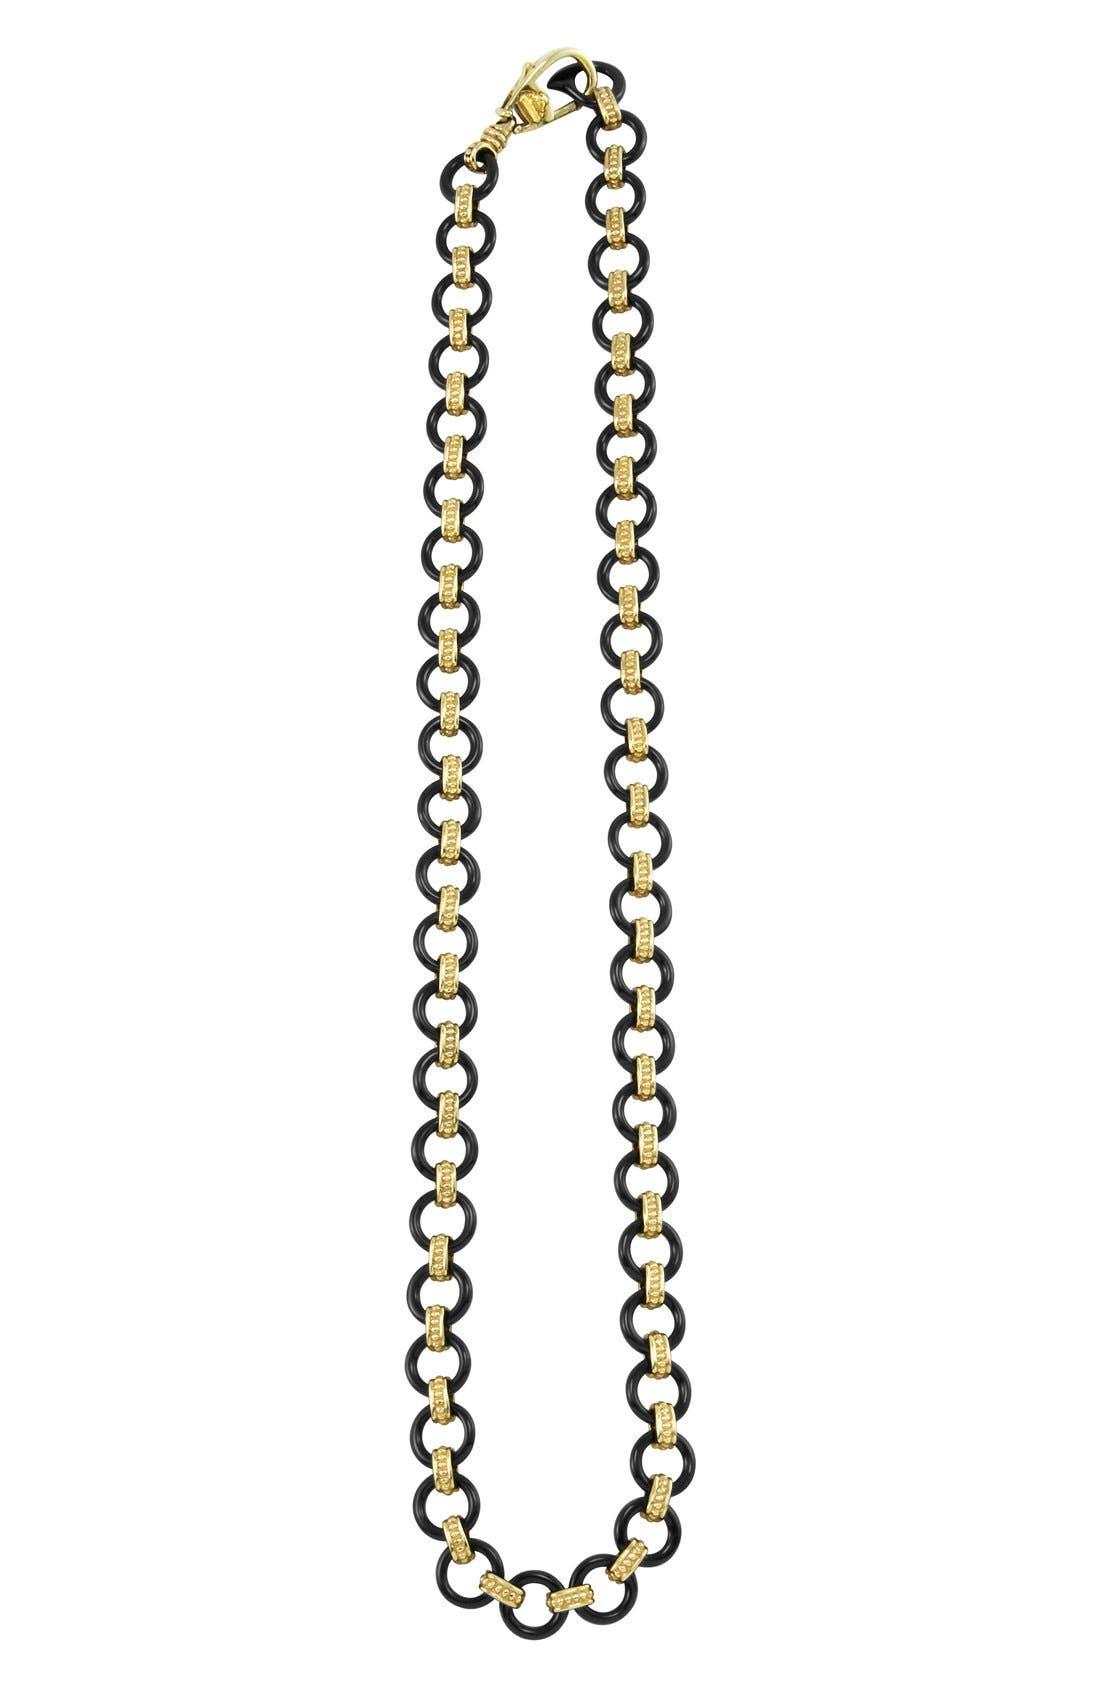 'Caviar Gold' Gold Link Necklace,                             Main thumbnail 1, color,                             001